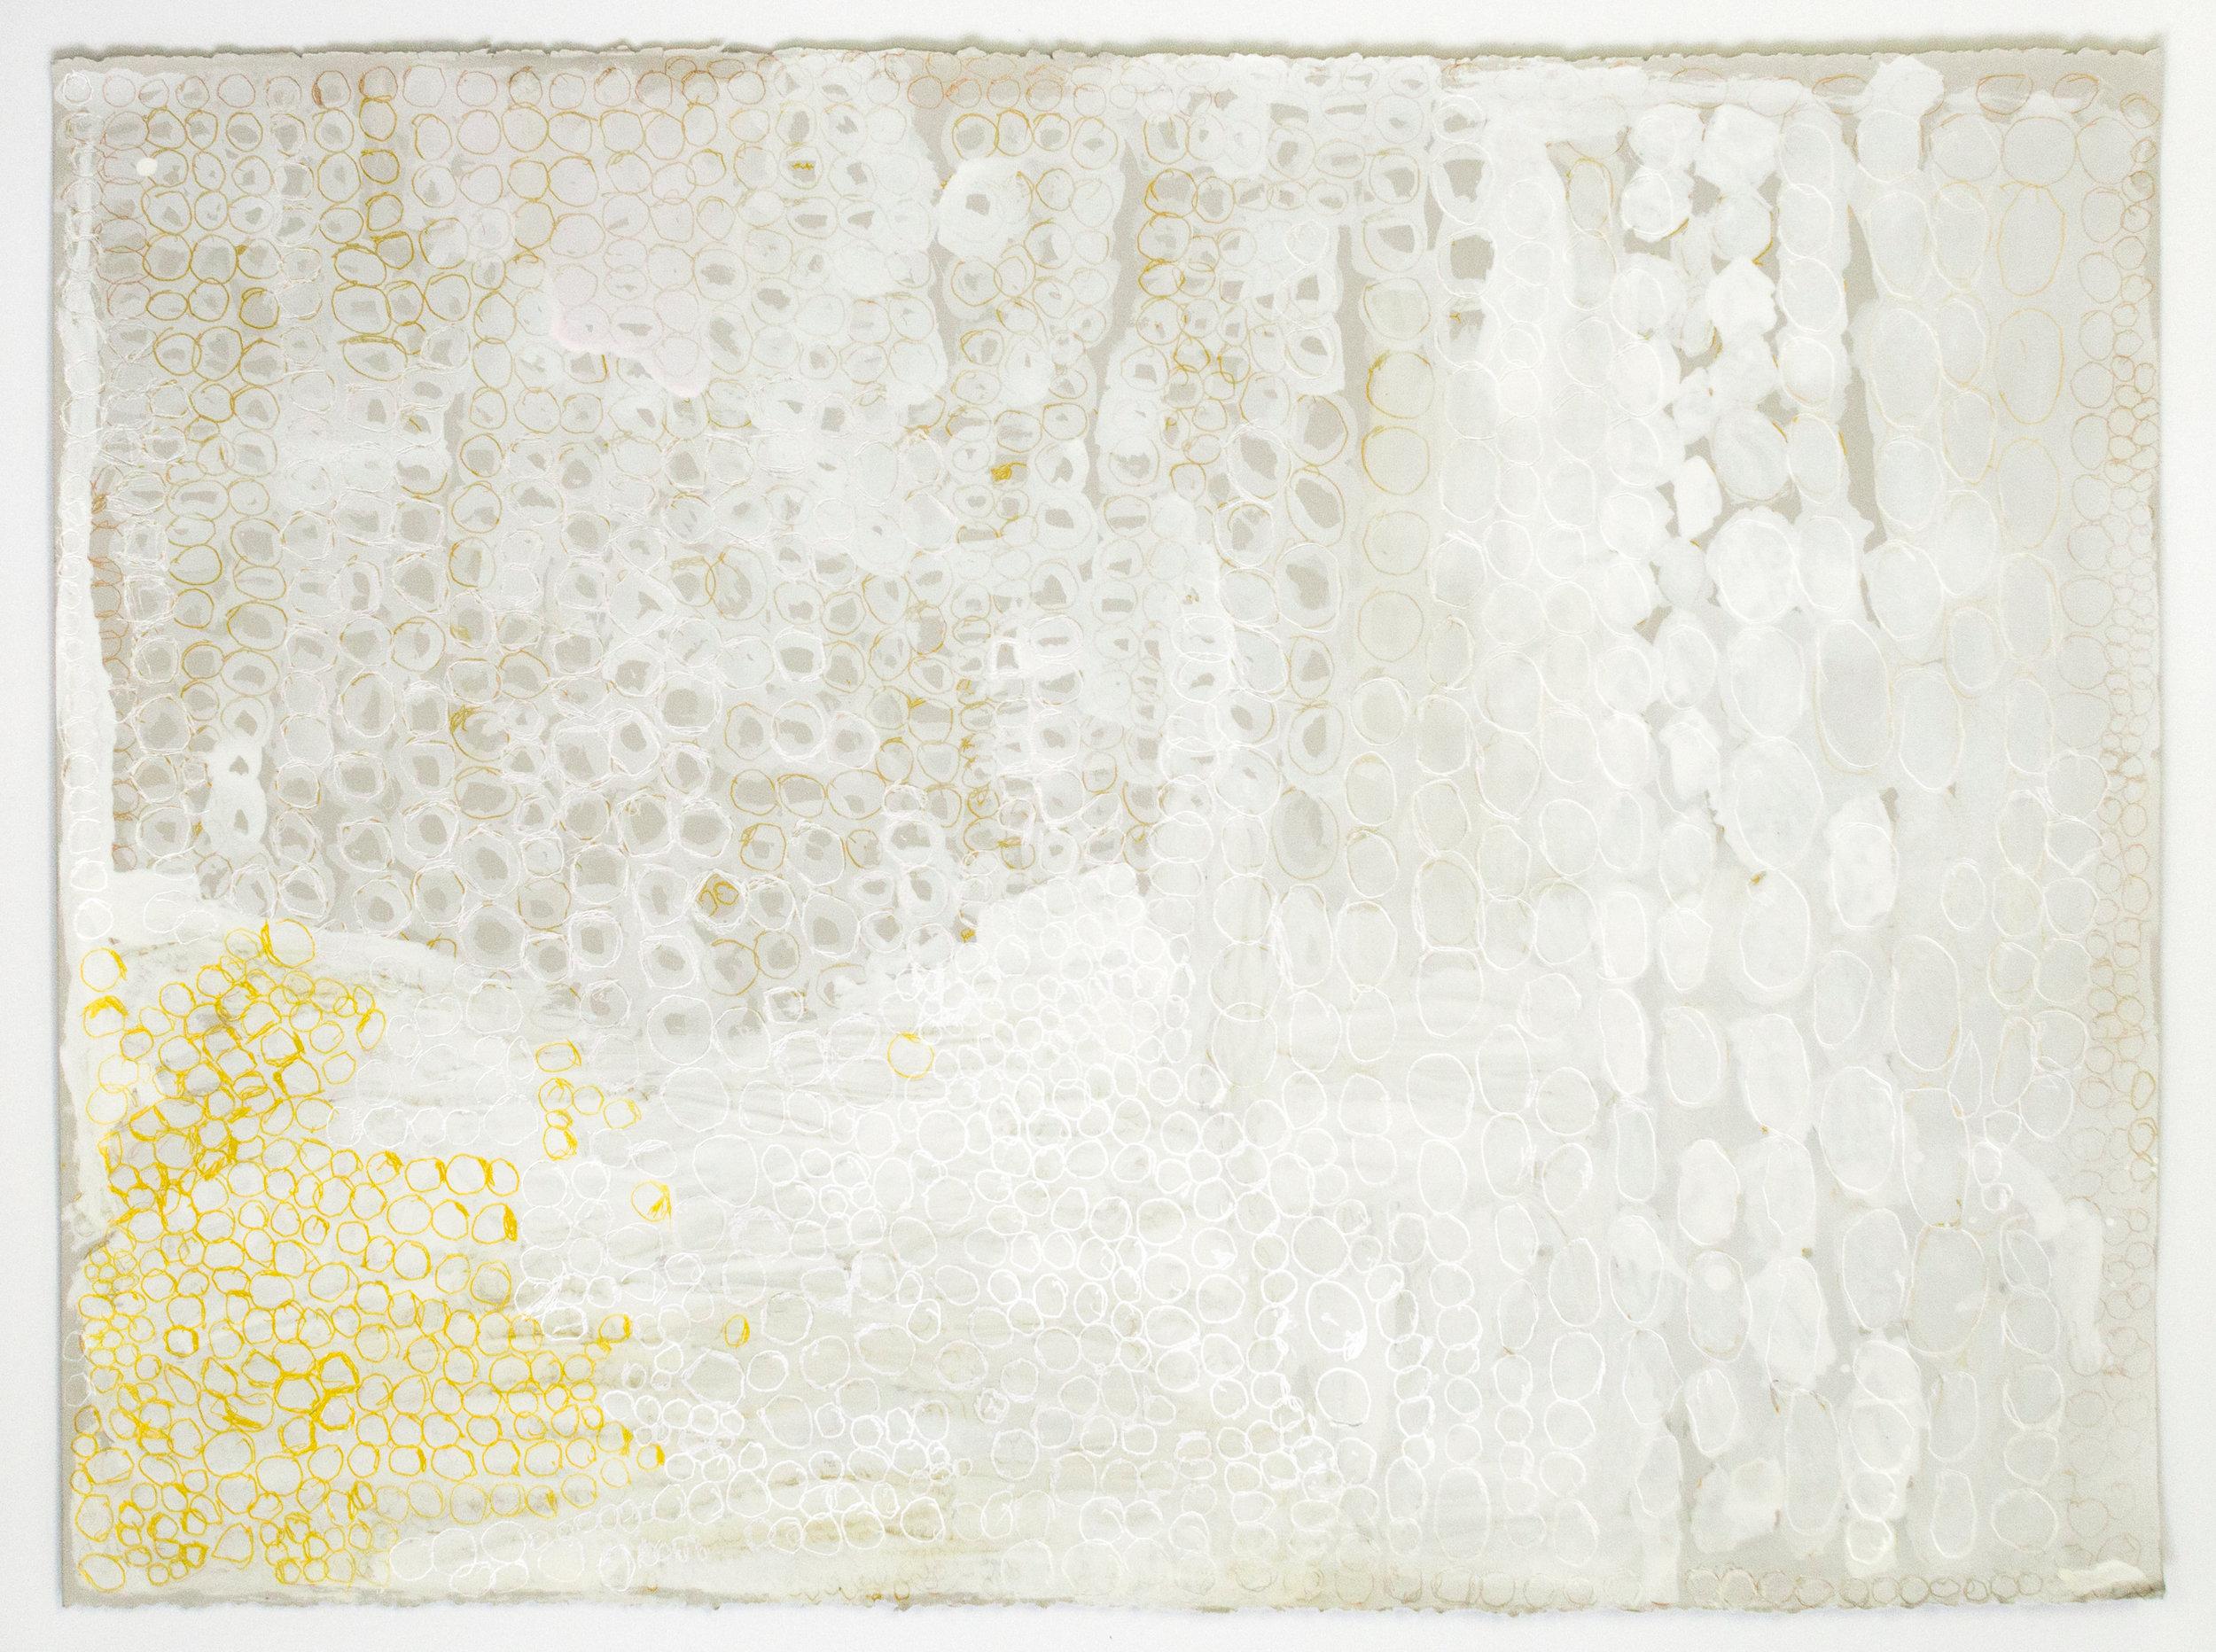 Barry Regan, Untitled (BR 099), 2018, 22.25 x 30 inches